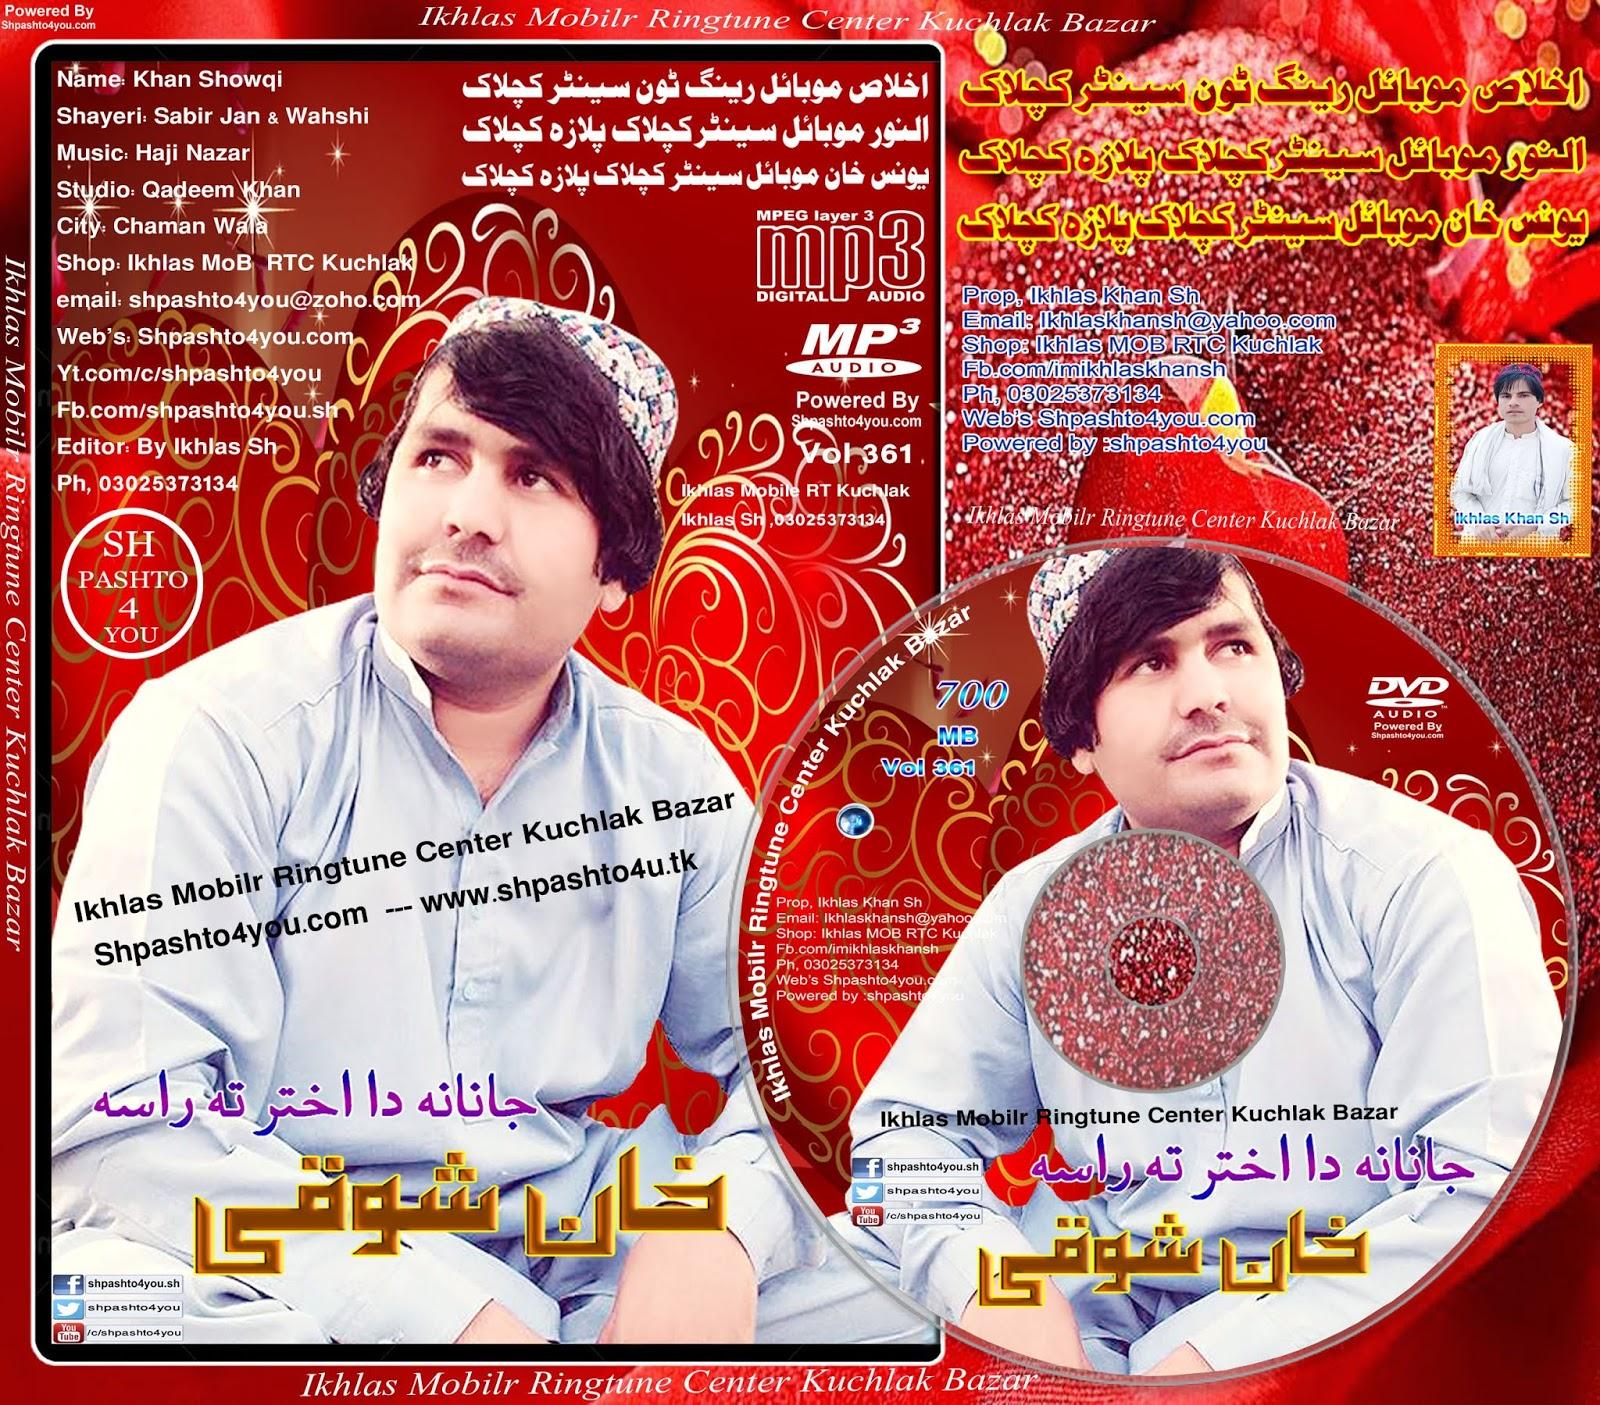 Khan Showqi New Mp3 Pashto Songs 2018 Eid Gift